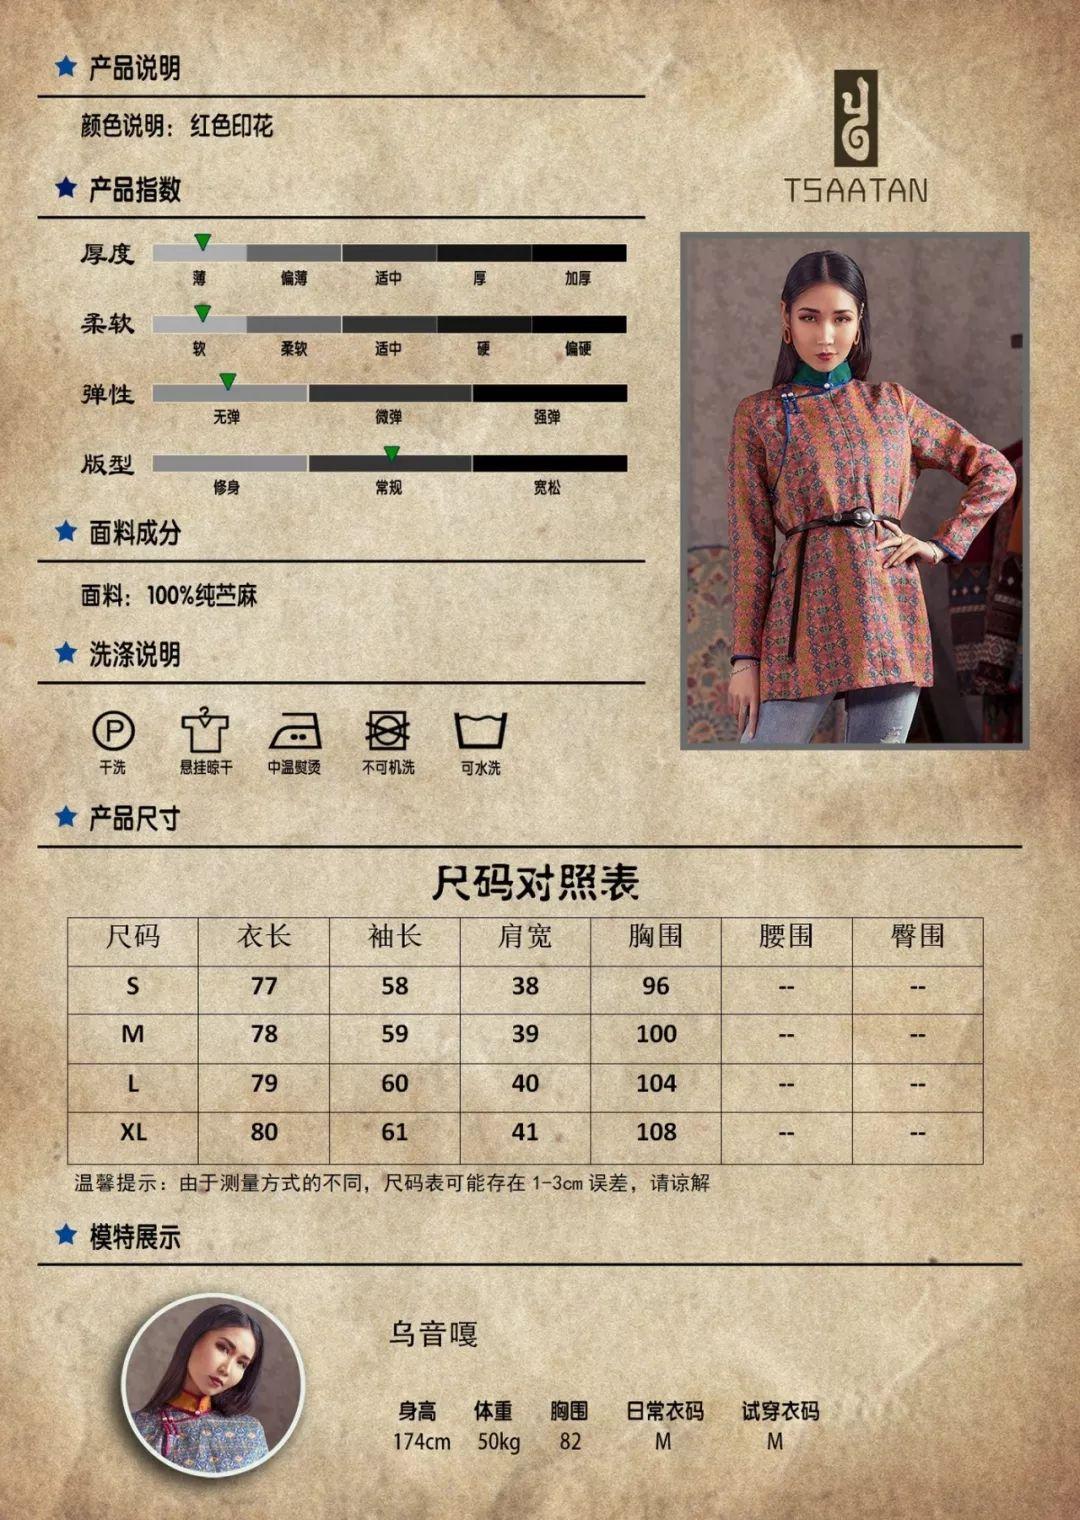 TSAATAN蒙古时装 2019夏季新款首发 第22张